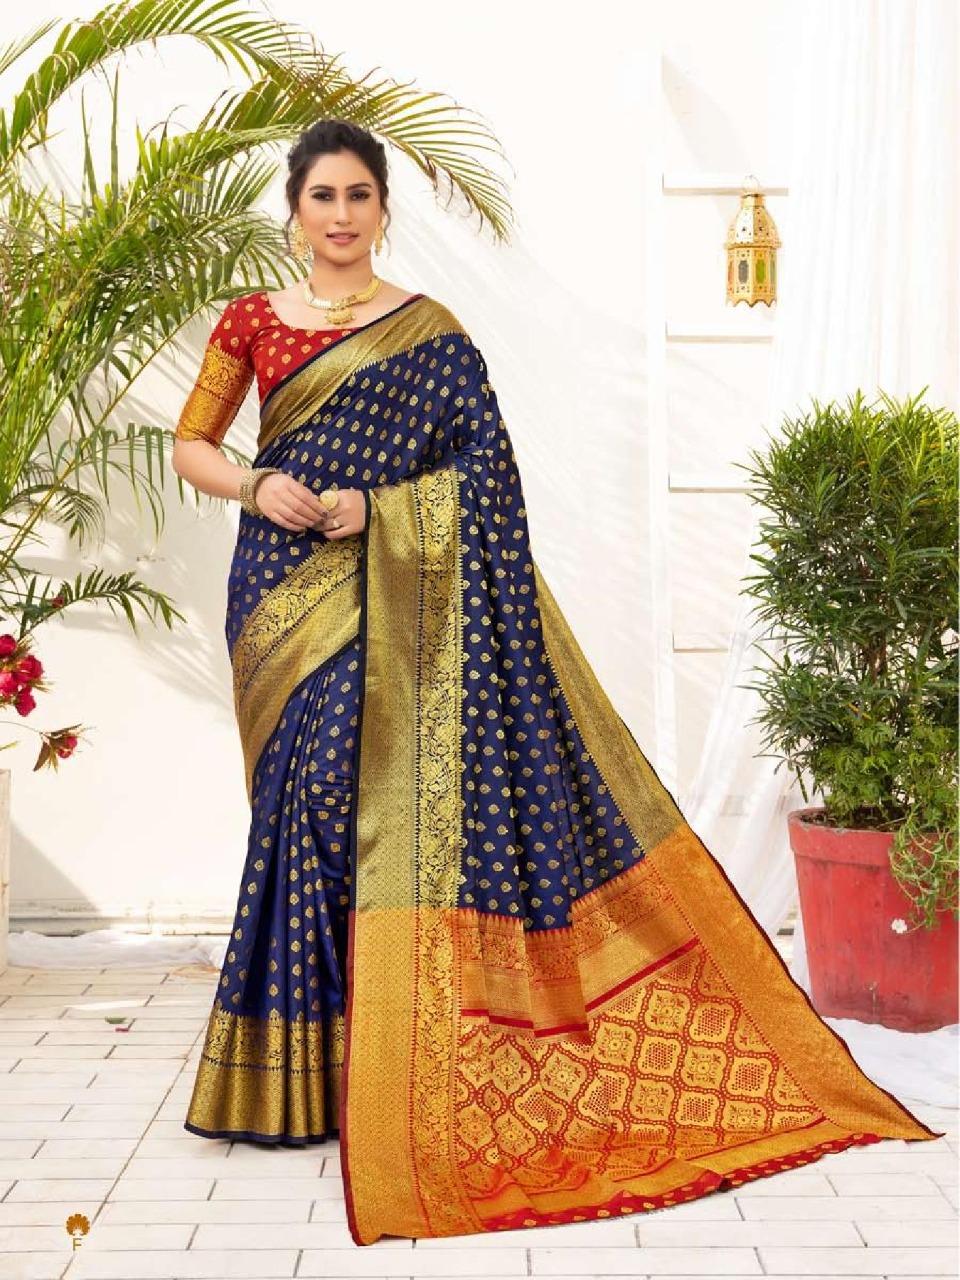 Shangrila  presents  Rajlaxmi Silk Festive Wear Sarees Collection